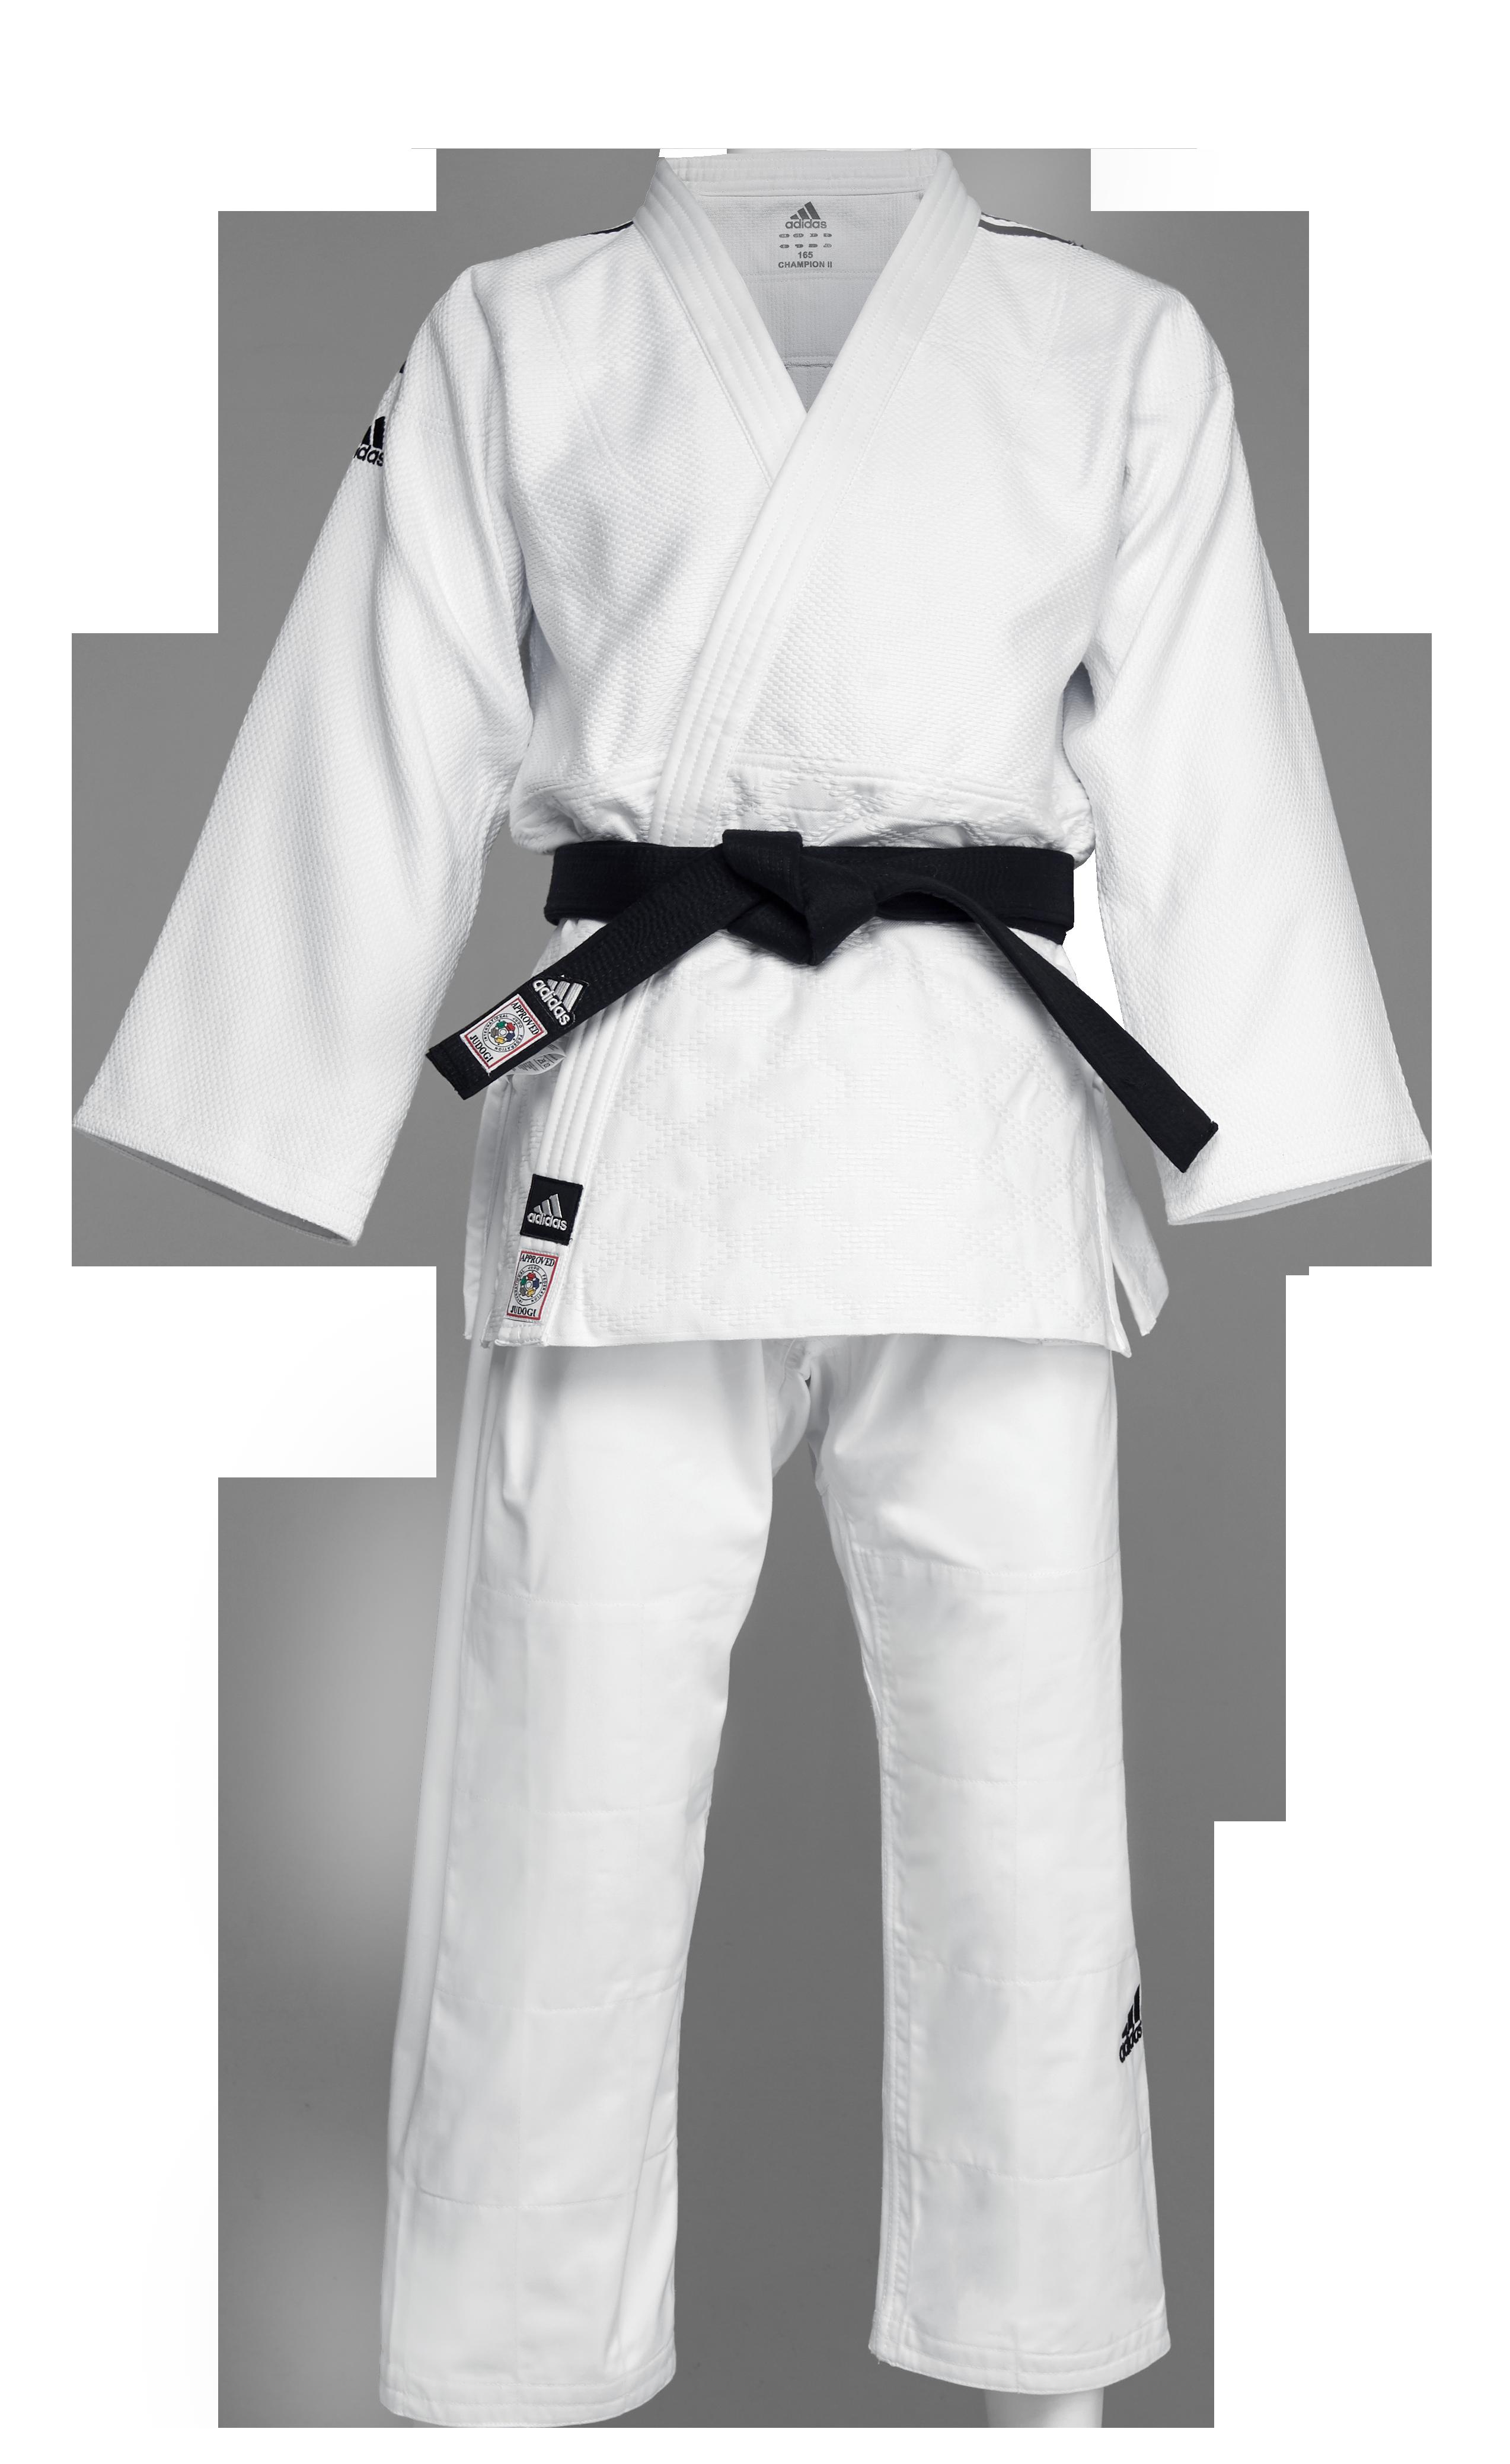 26351fdc6 IJF Champion 2 White